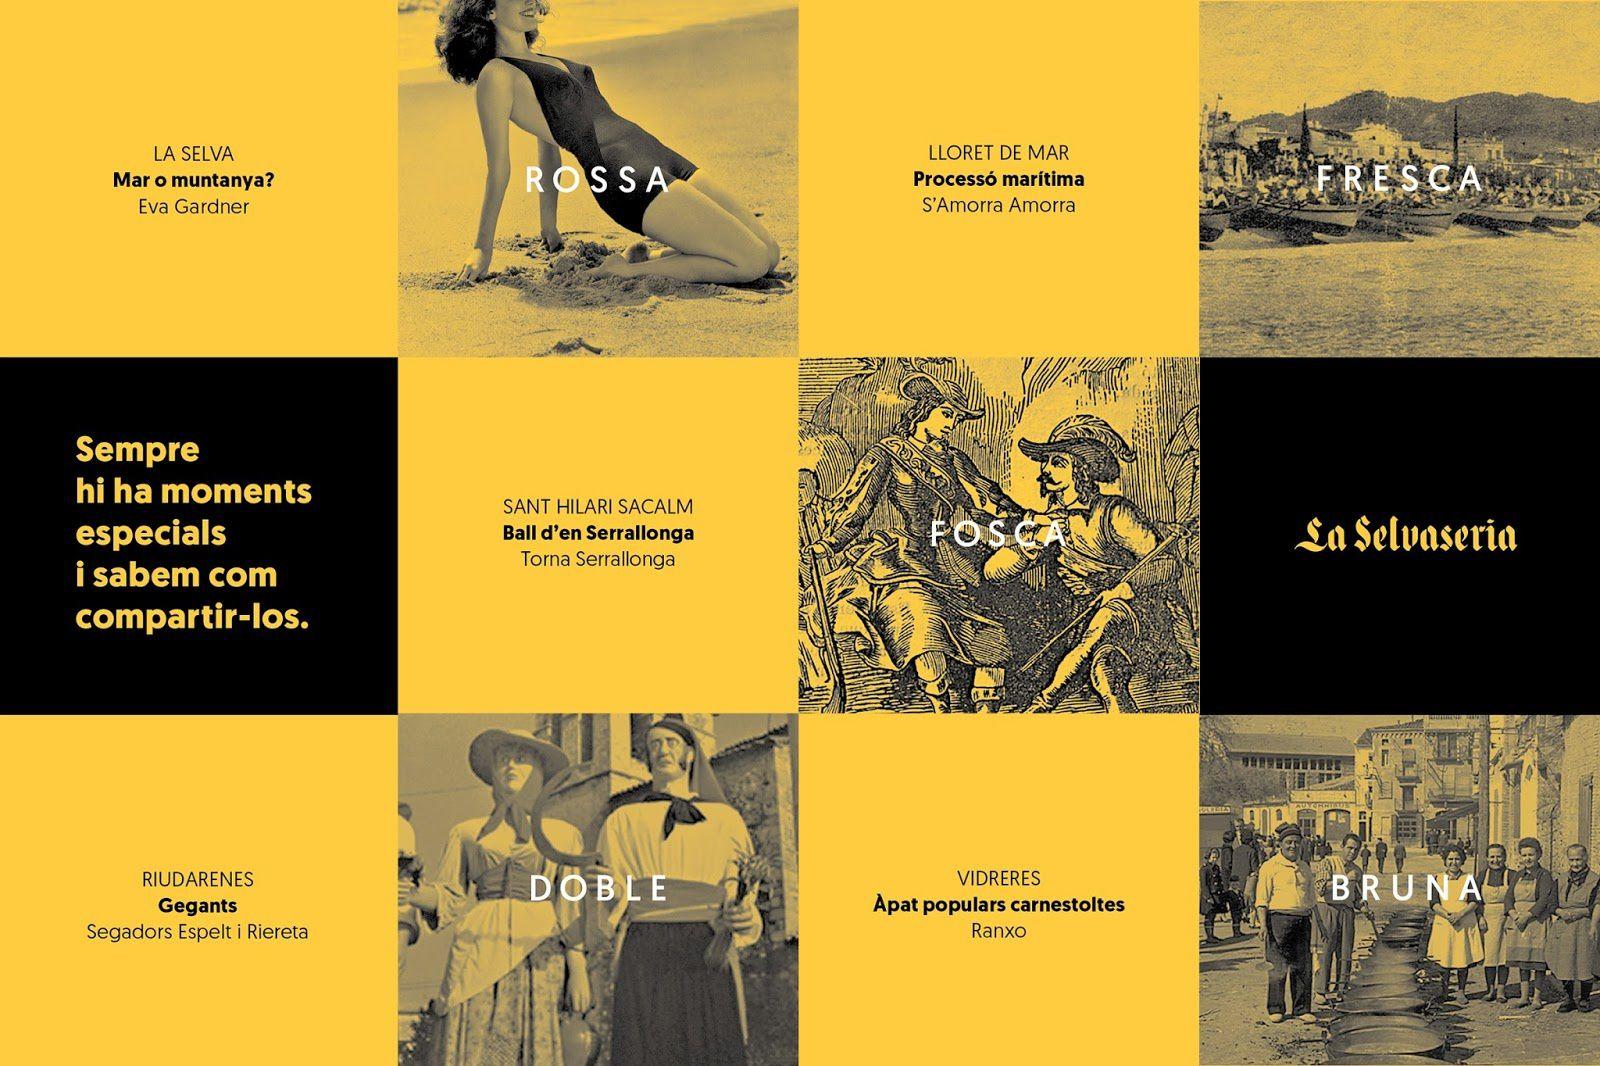 La Selvaseria (bière artisanale catalane) I Design : La Fonda Gràfica, Vidreres, Catalogne, Espagne (février 2017)